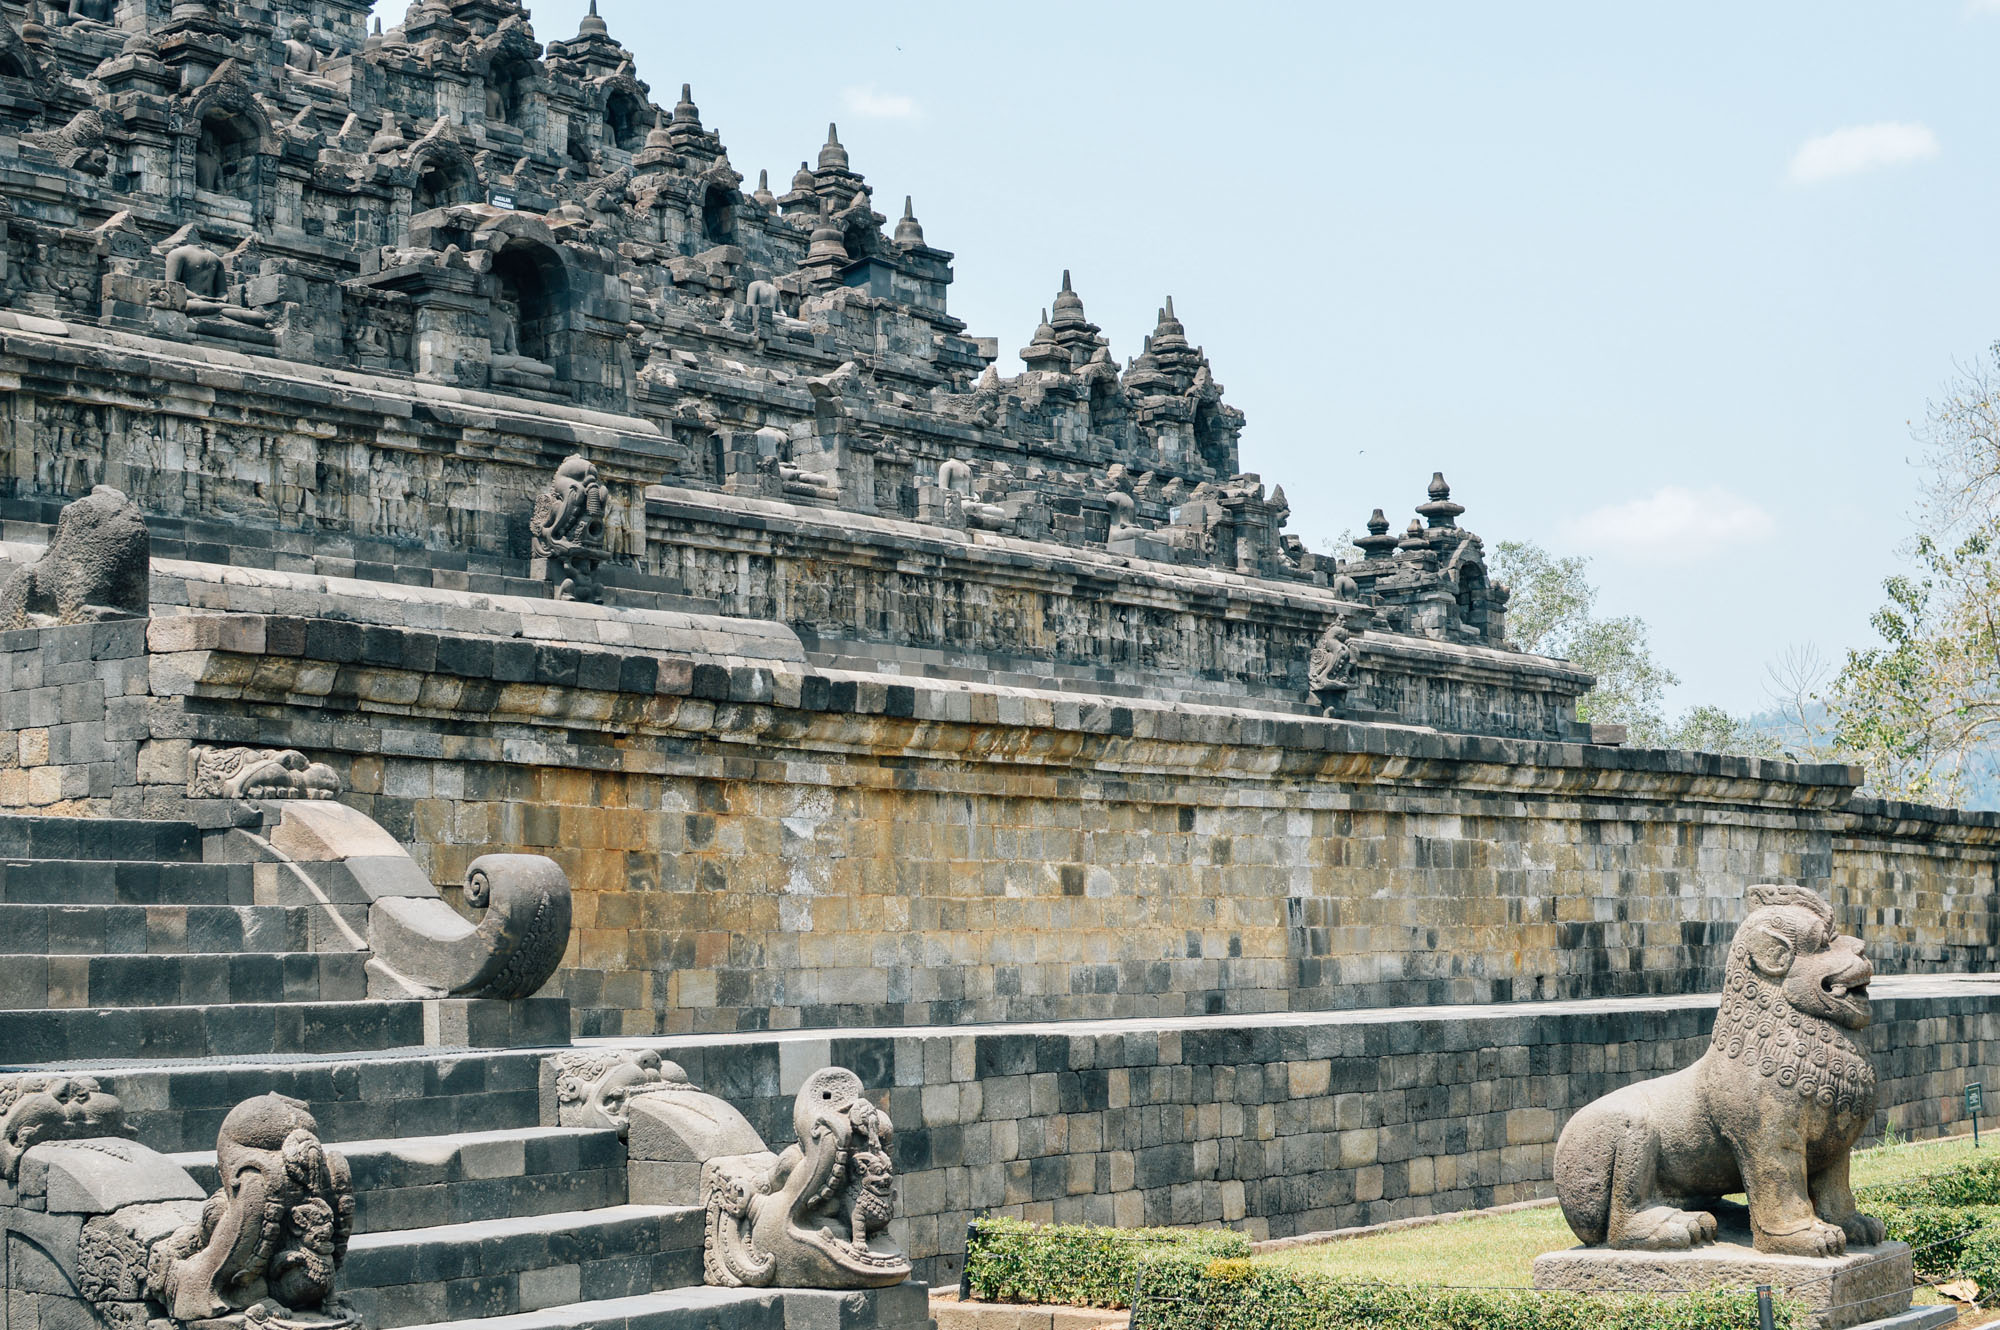 yogya 1 4 - Jogyakarta met Tempels